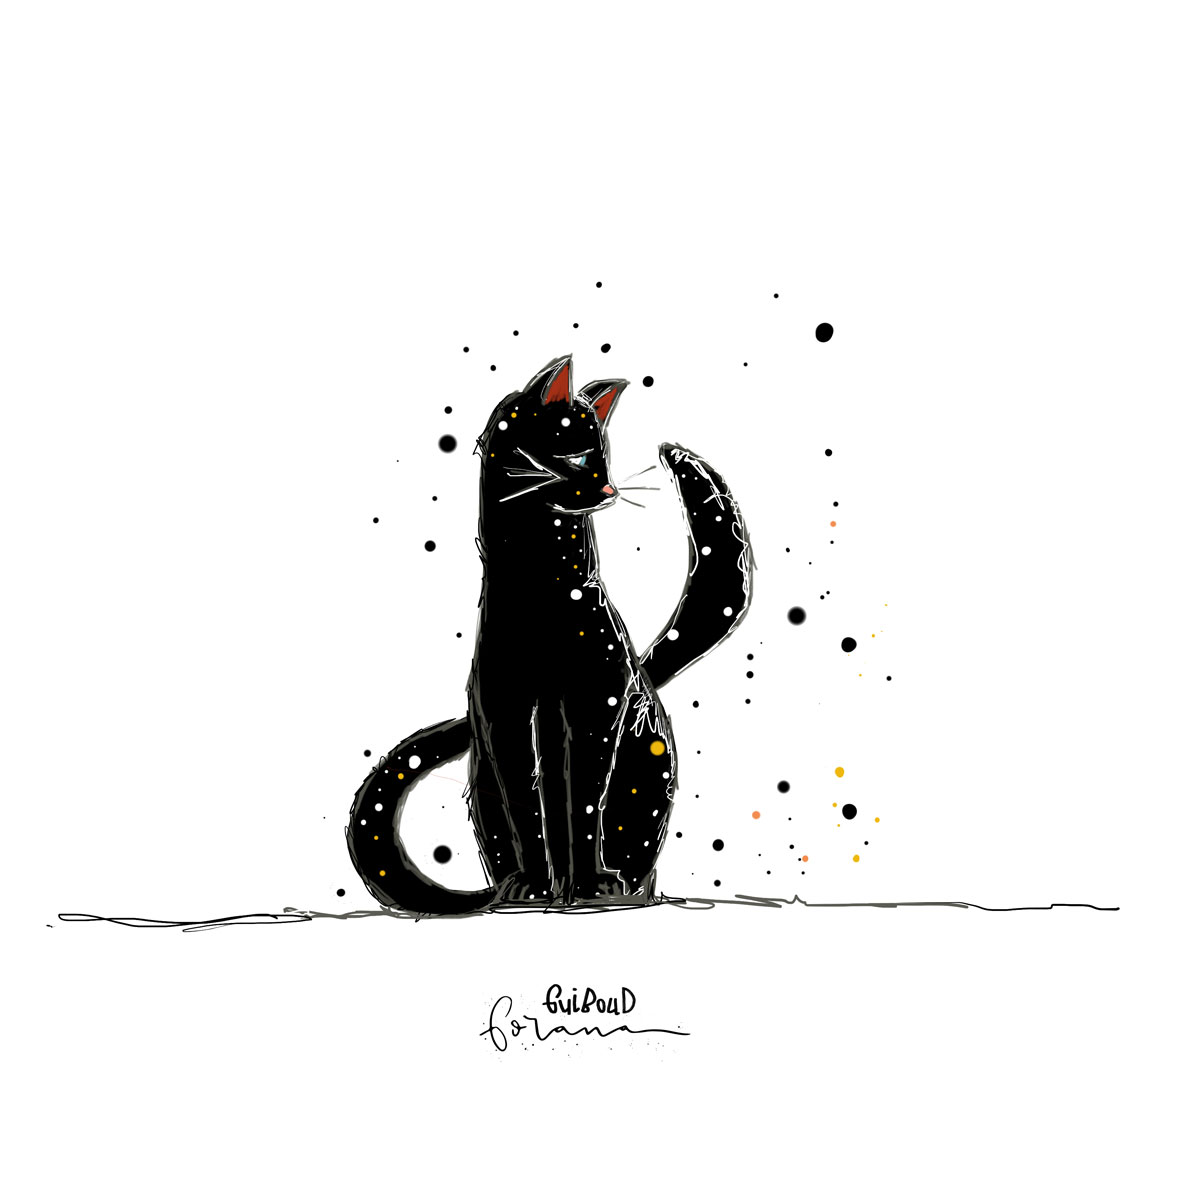 Schwarze Katze - ---Photoshop am iPad mit Apple Pencil